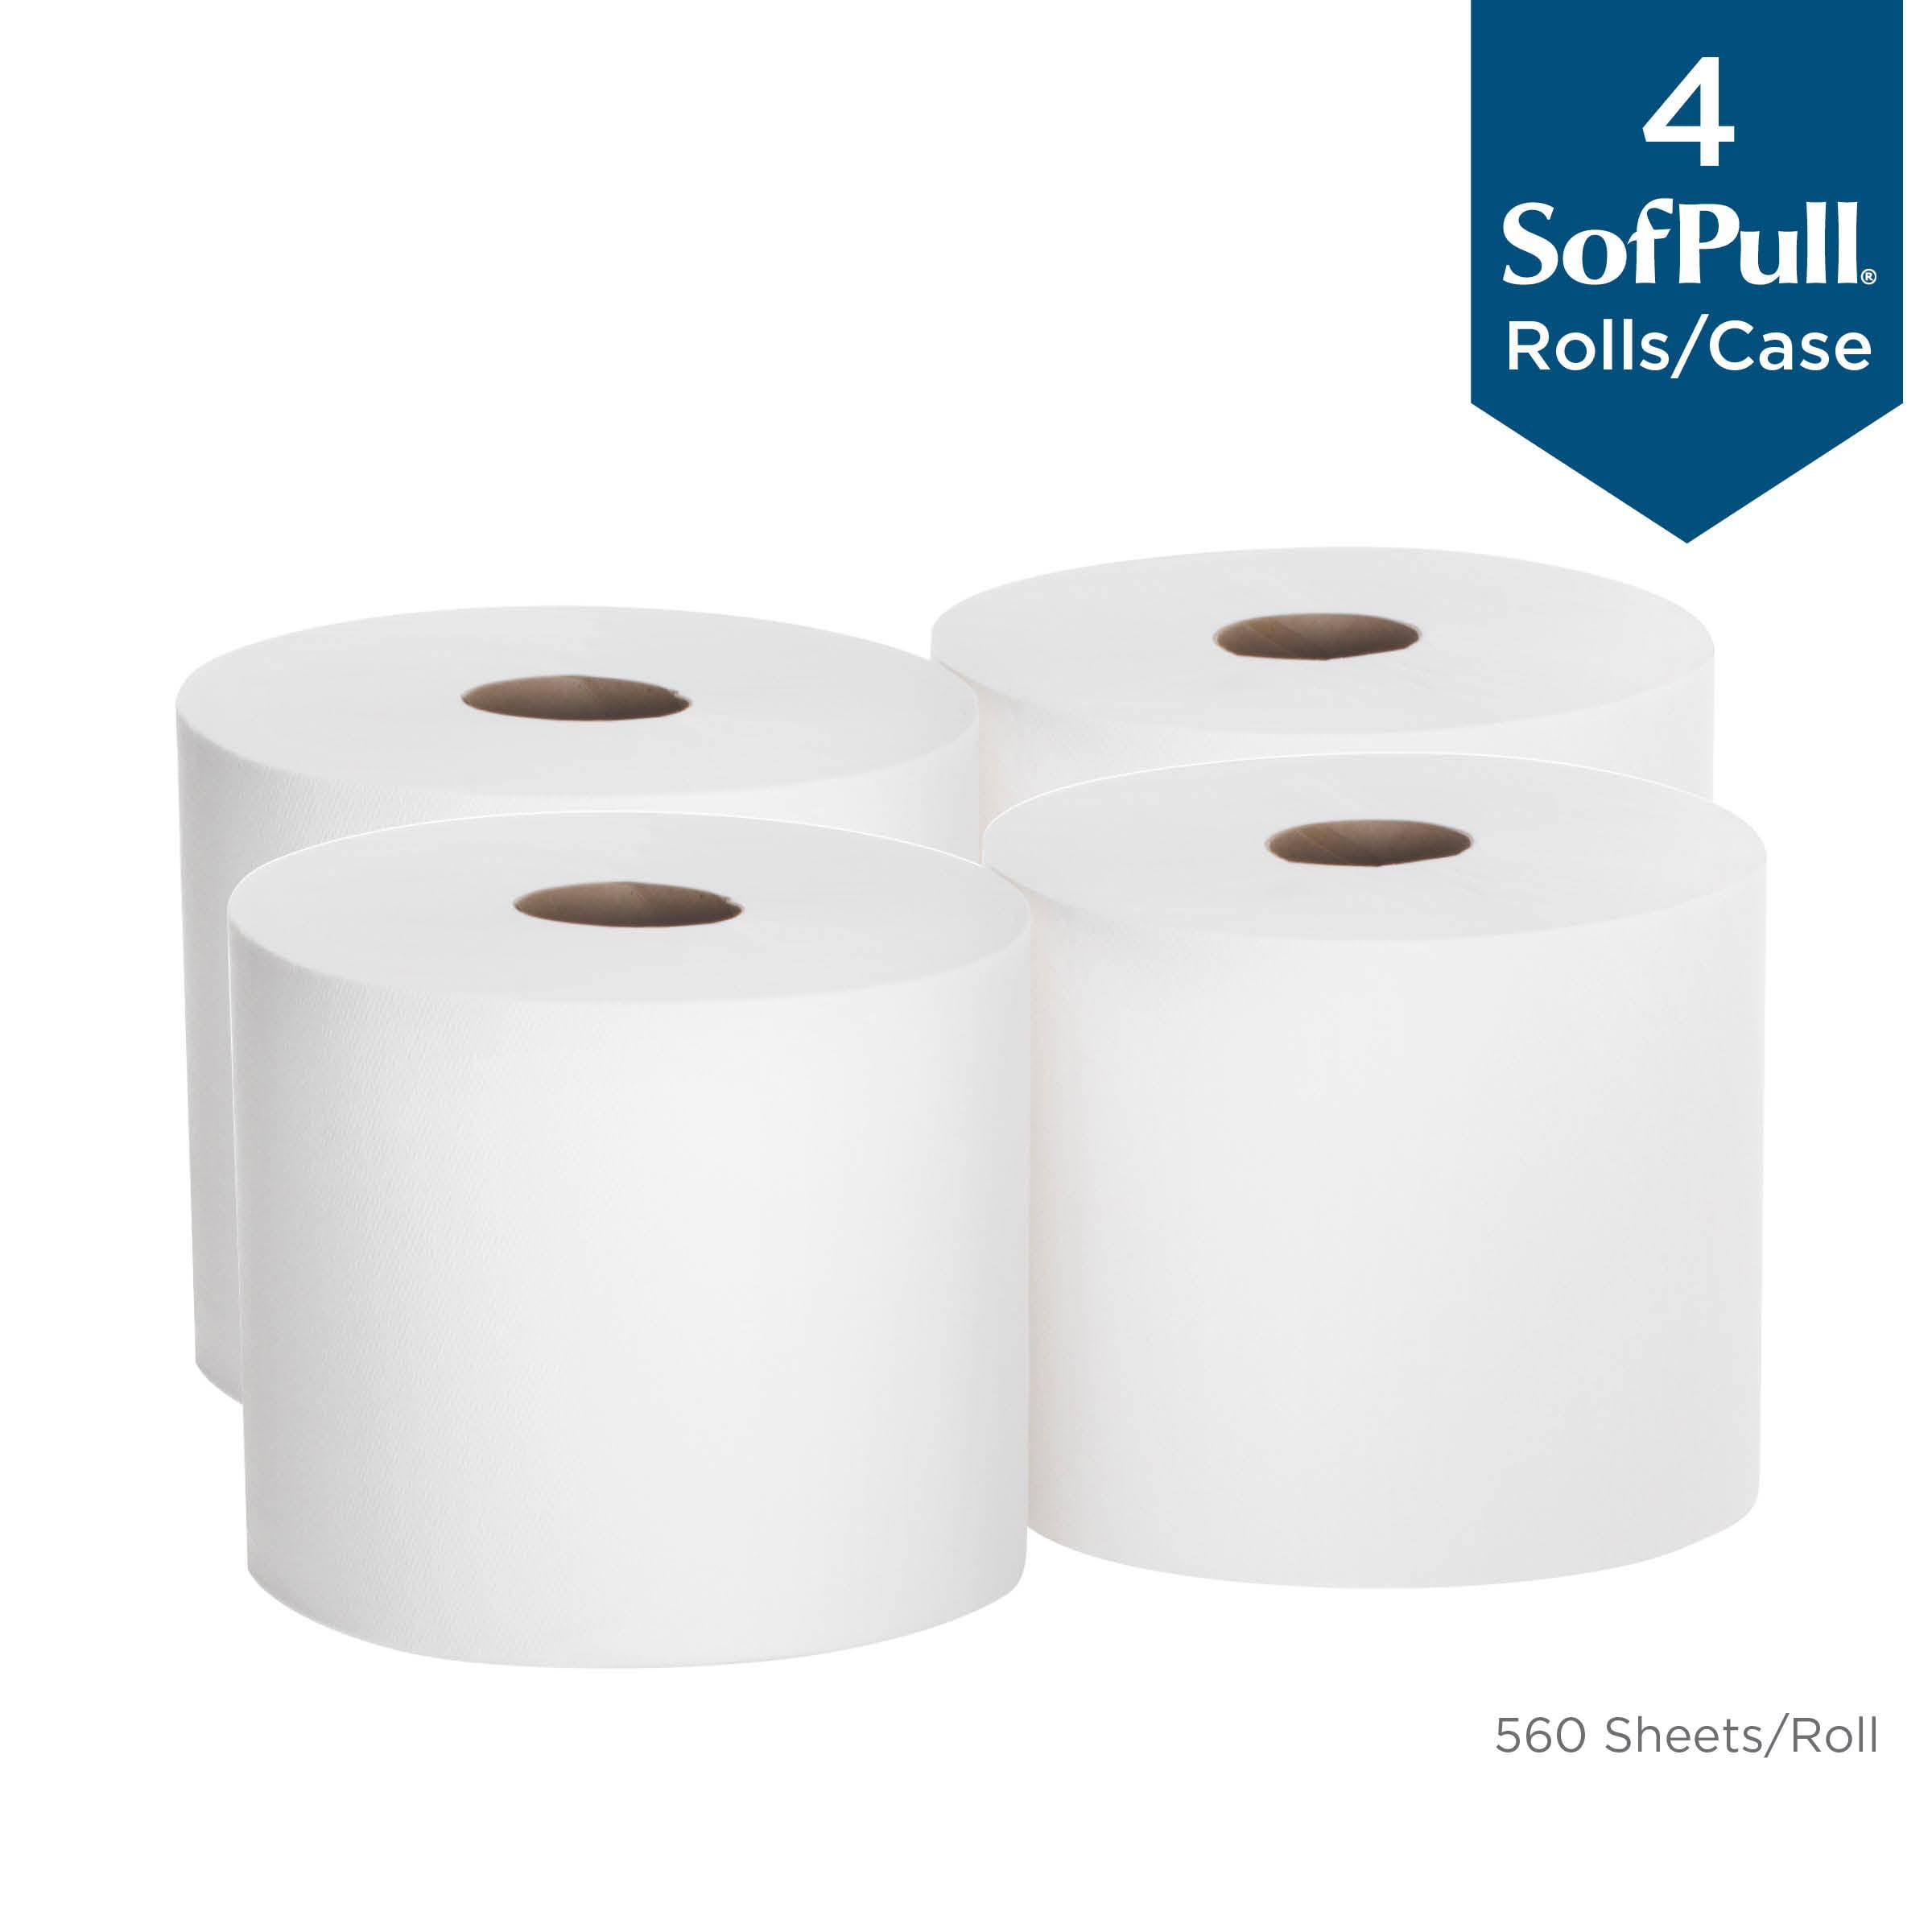 6 Rolls Commercial Center Pull Towels 600 Towels per Roll